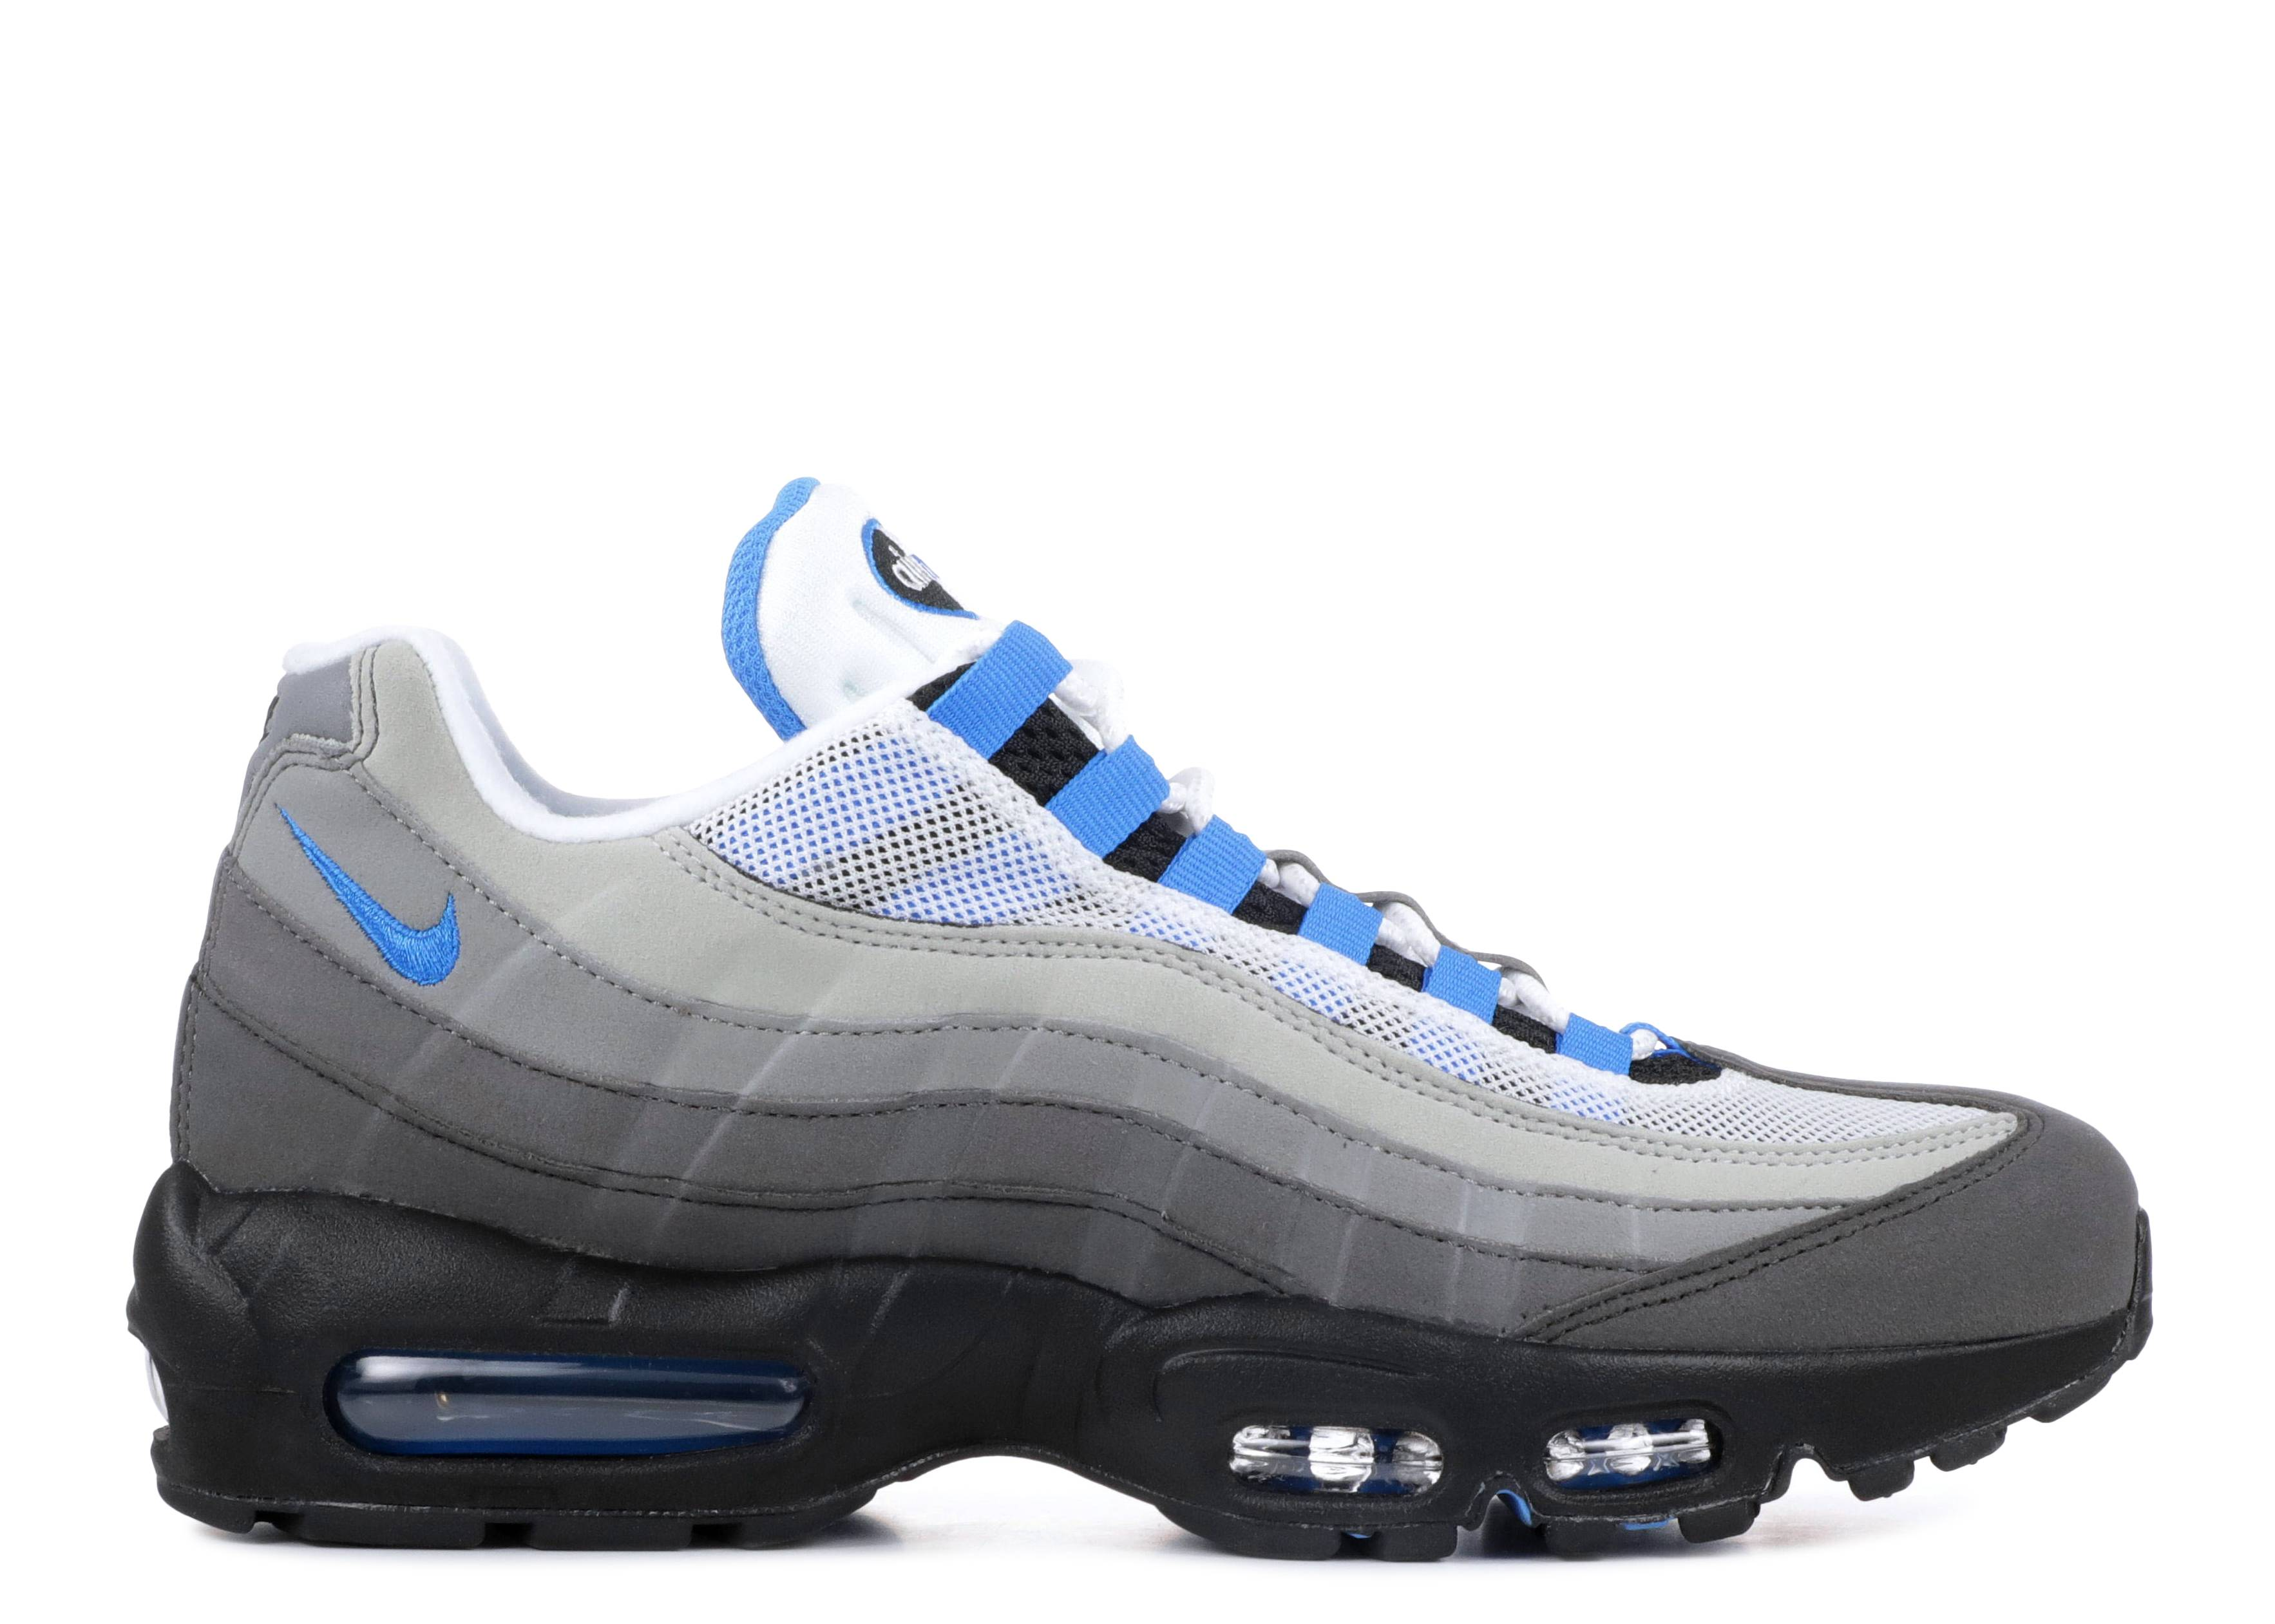 88ddc200b6 Air Max '95 - Nike - at8696 100 - white/crystal blue | Flight Club